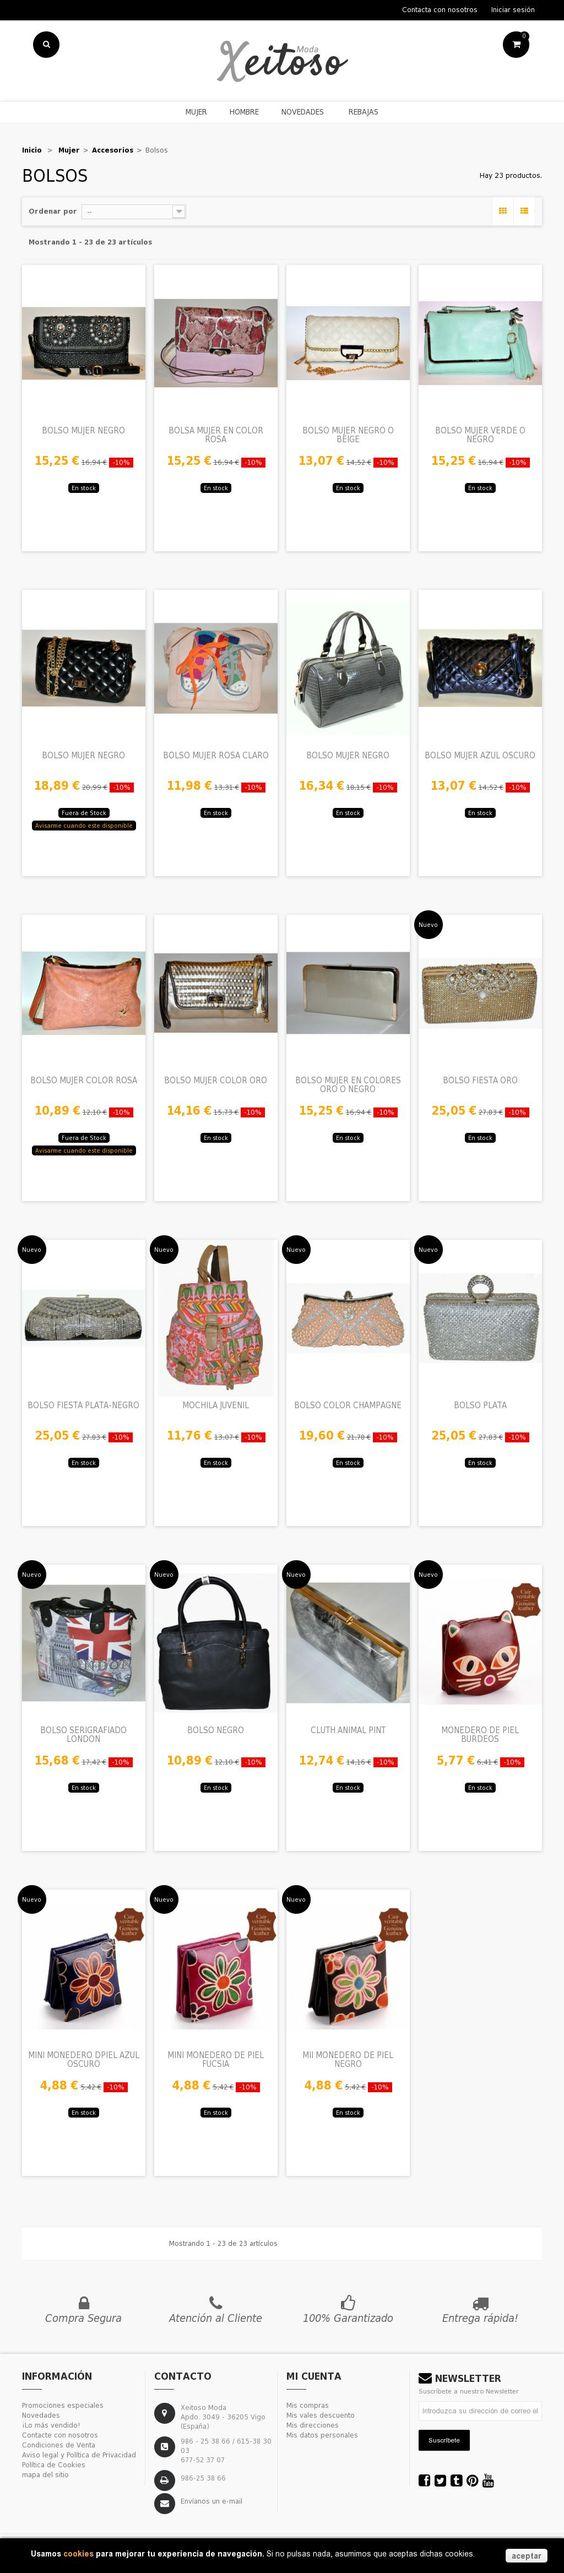 Bolsos, mochilas, cluth, compras en España